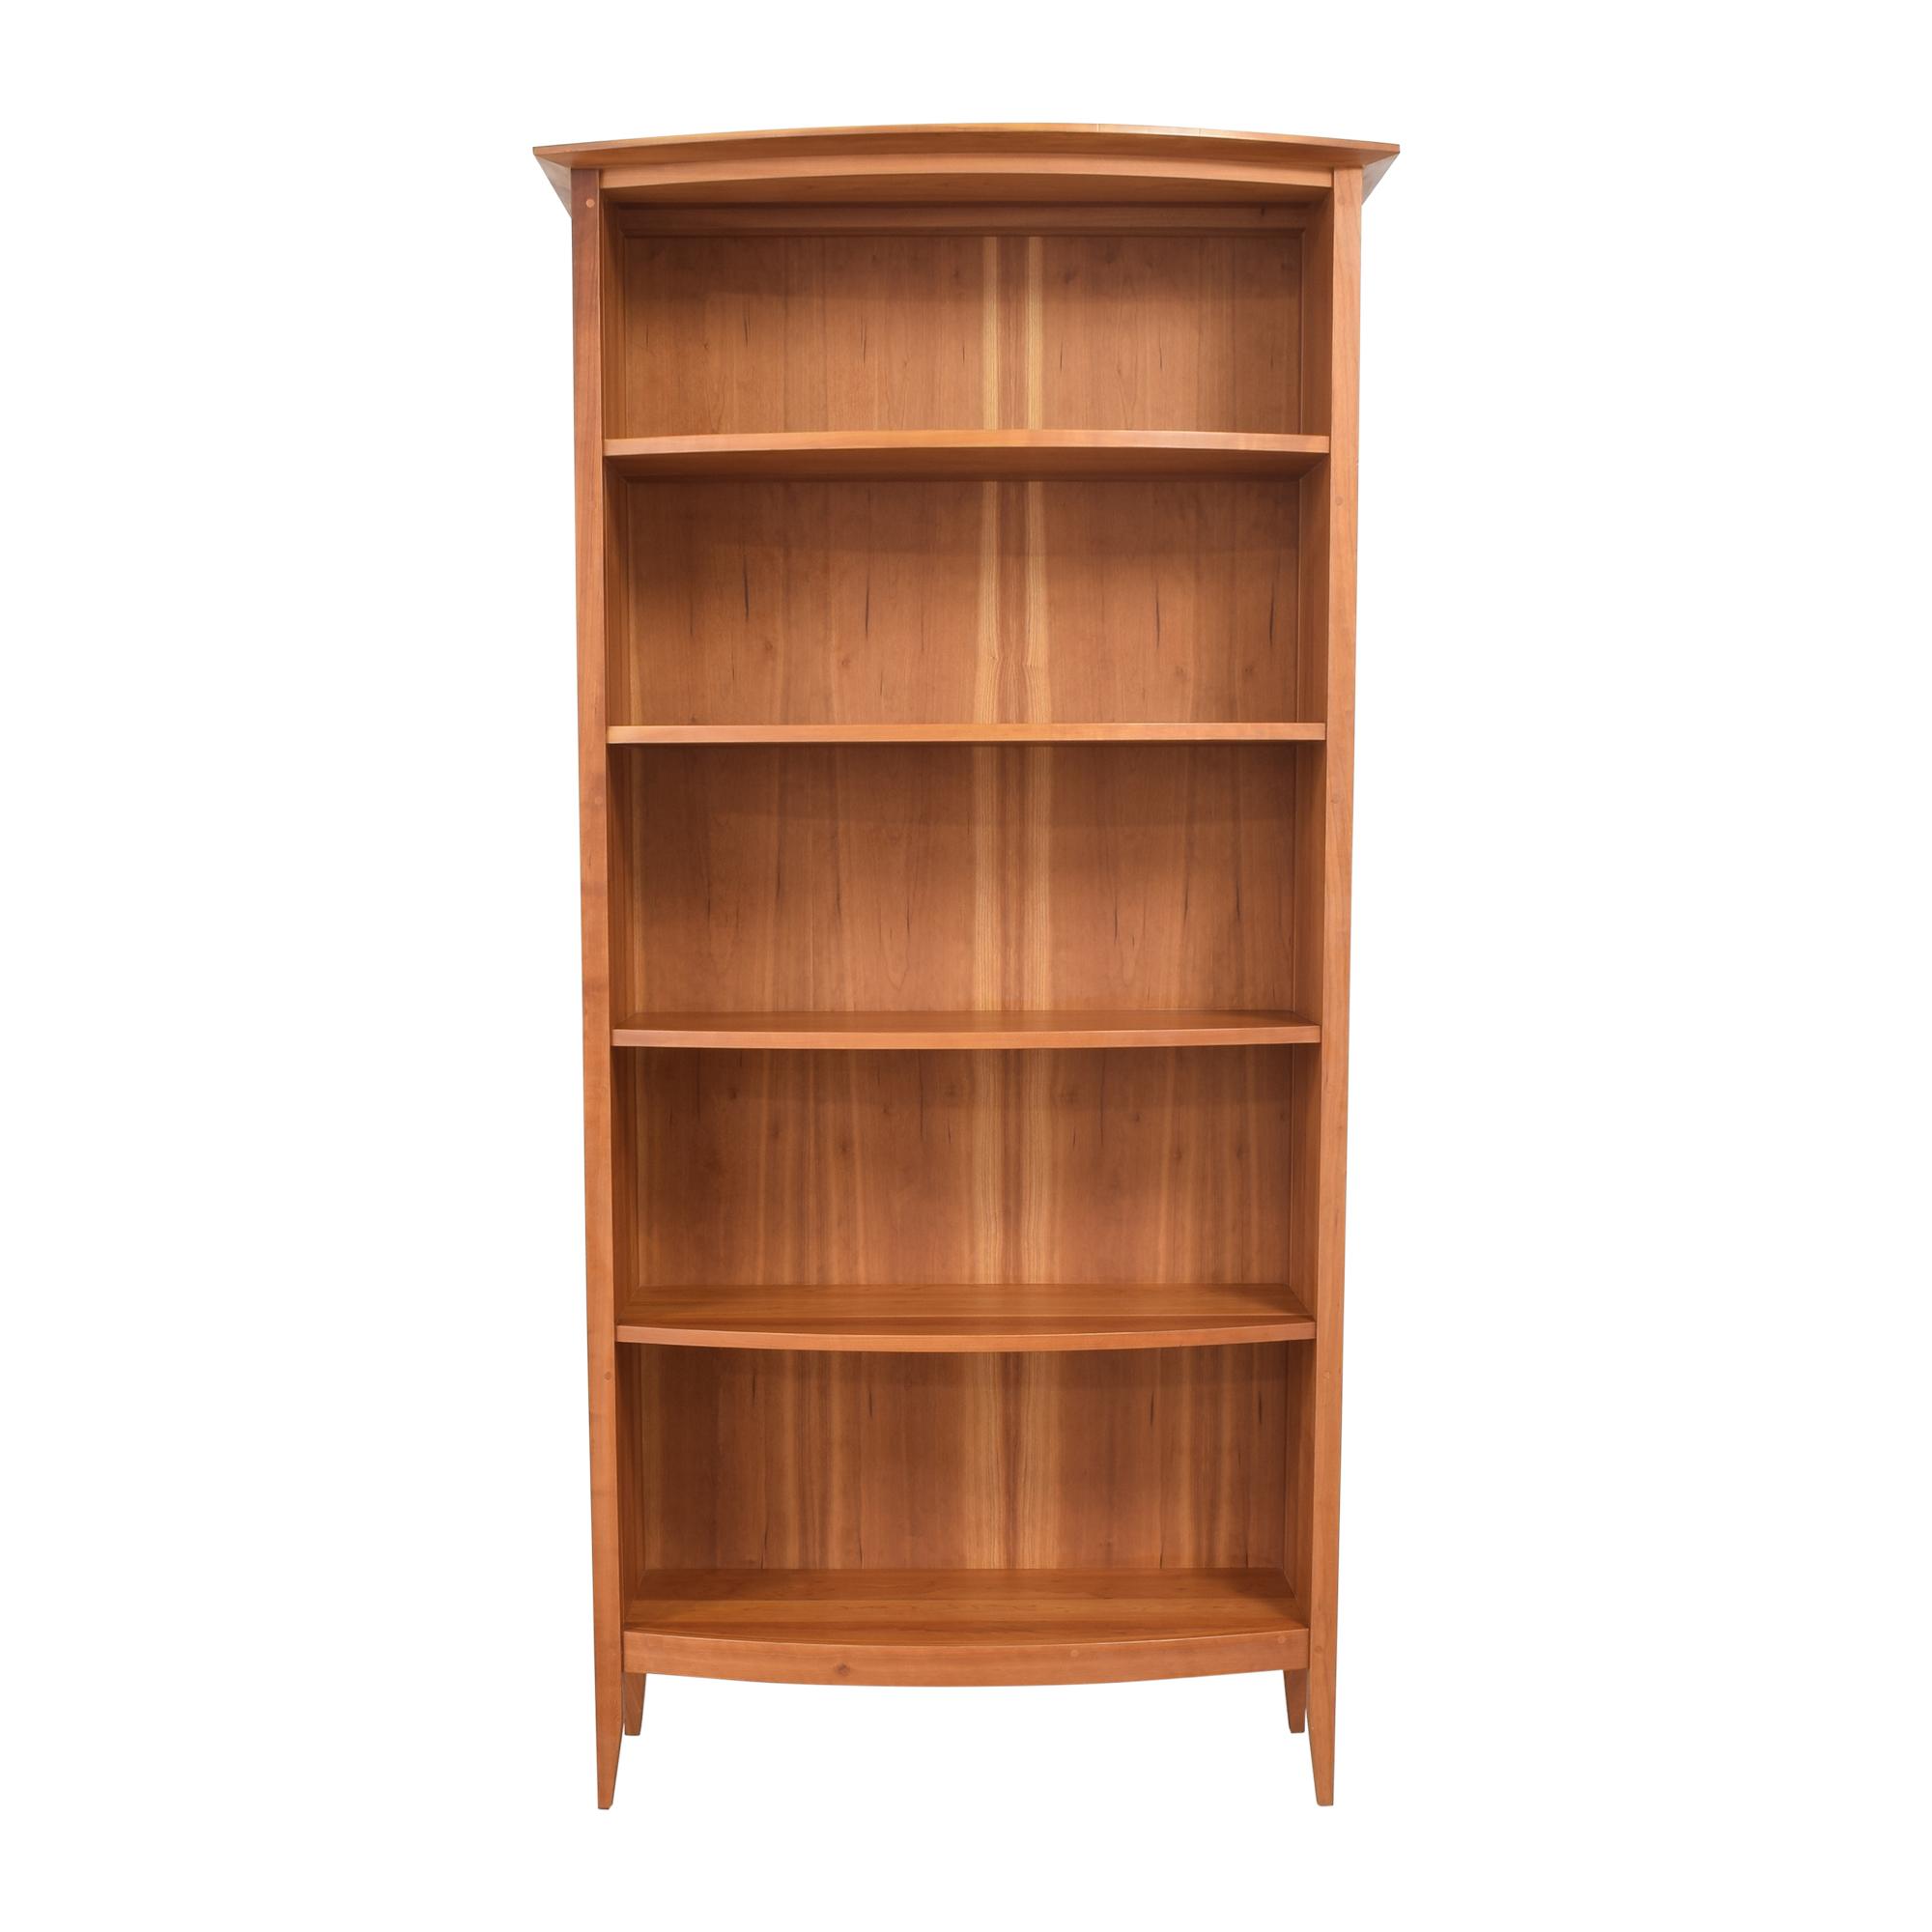 Pompanoosuc Mills Pompanoosuc Mills Chelsea Bookcase for sale